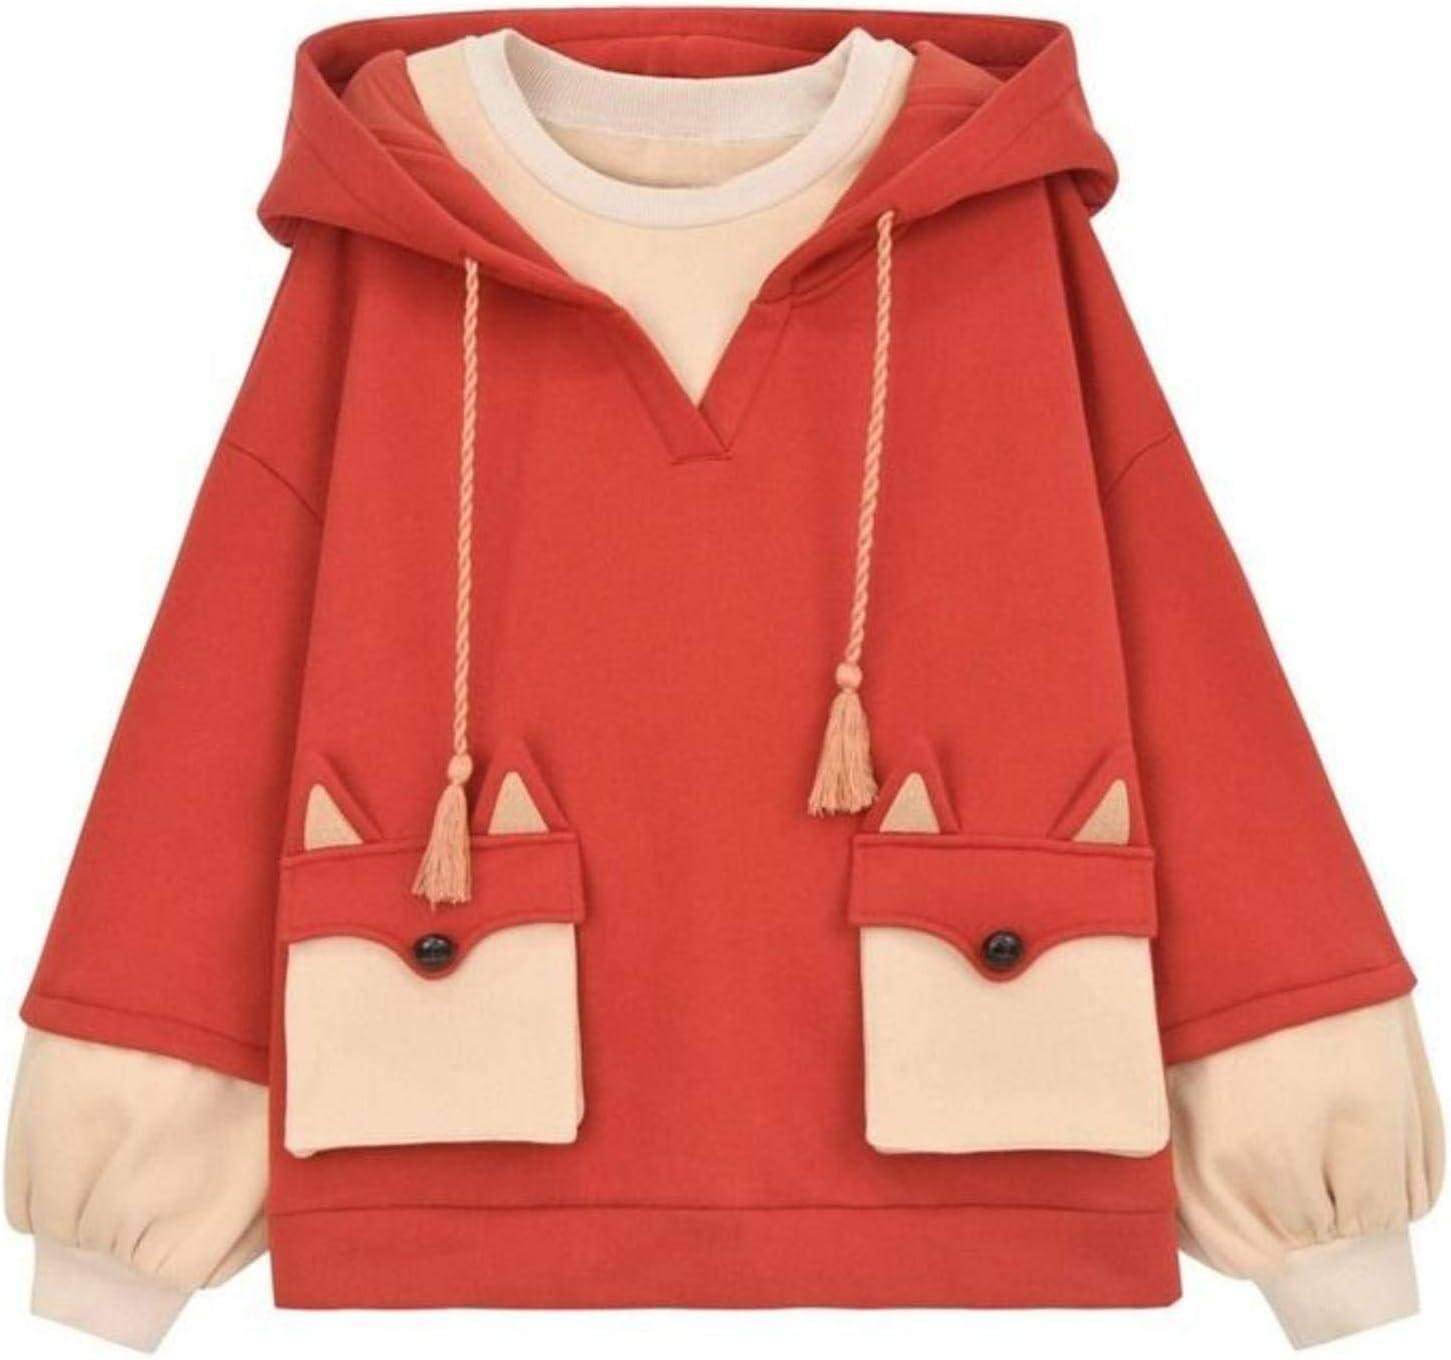 NC Harajuku Anime Hoodie Women Korean Kawaii Oversized Streetwear Kpop Fall Winter Christmas Couple Clothes Tops